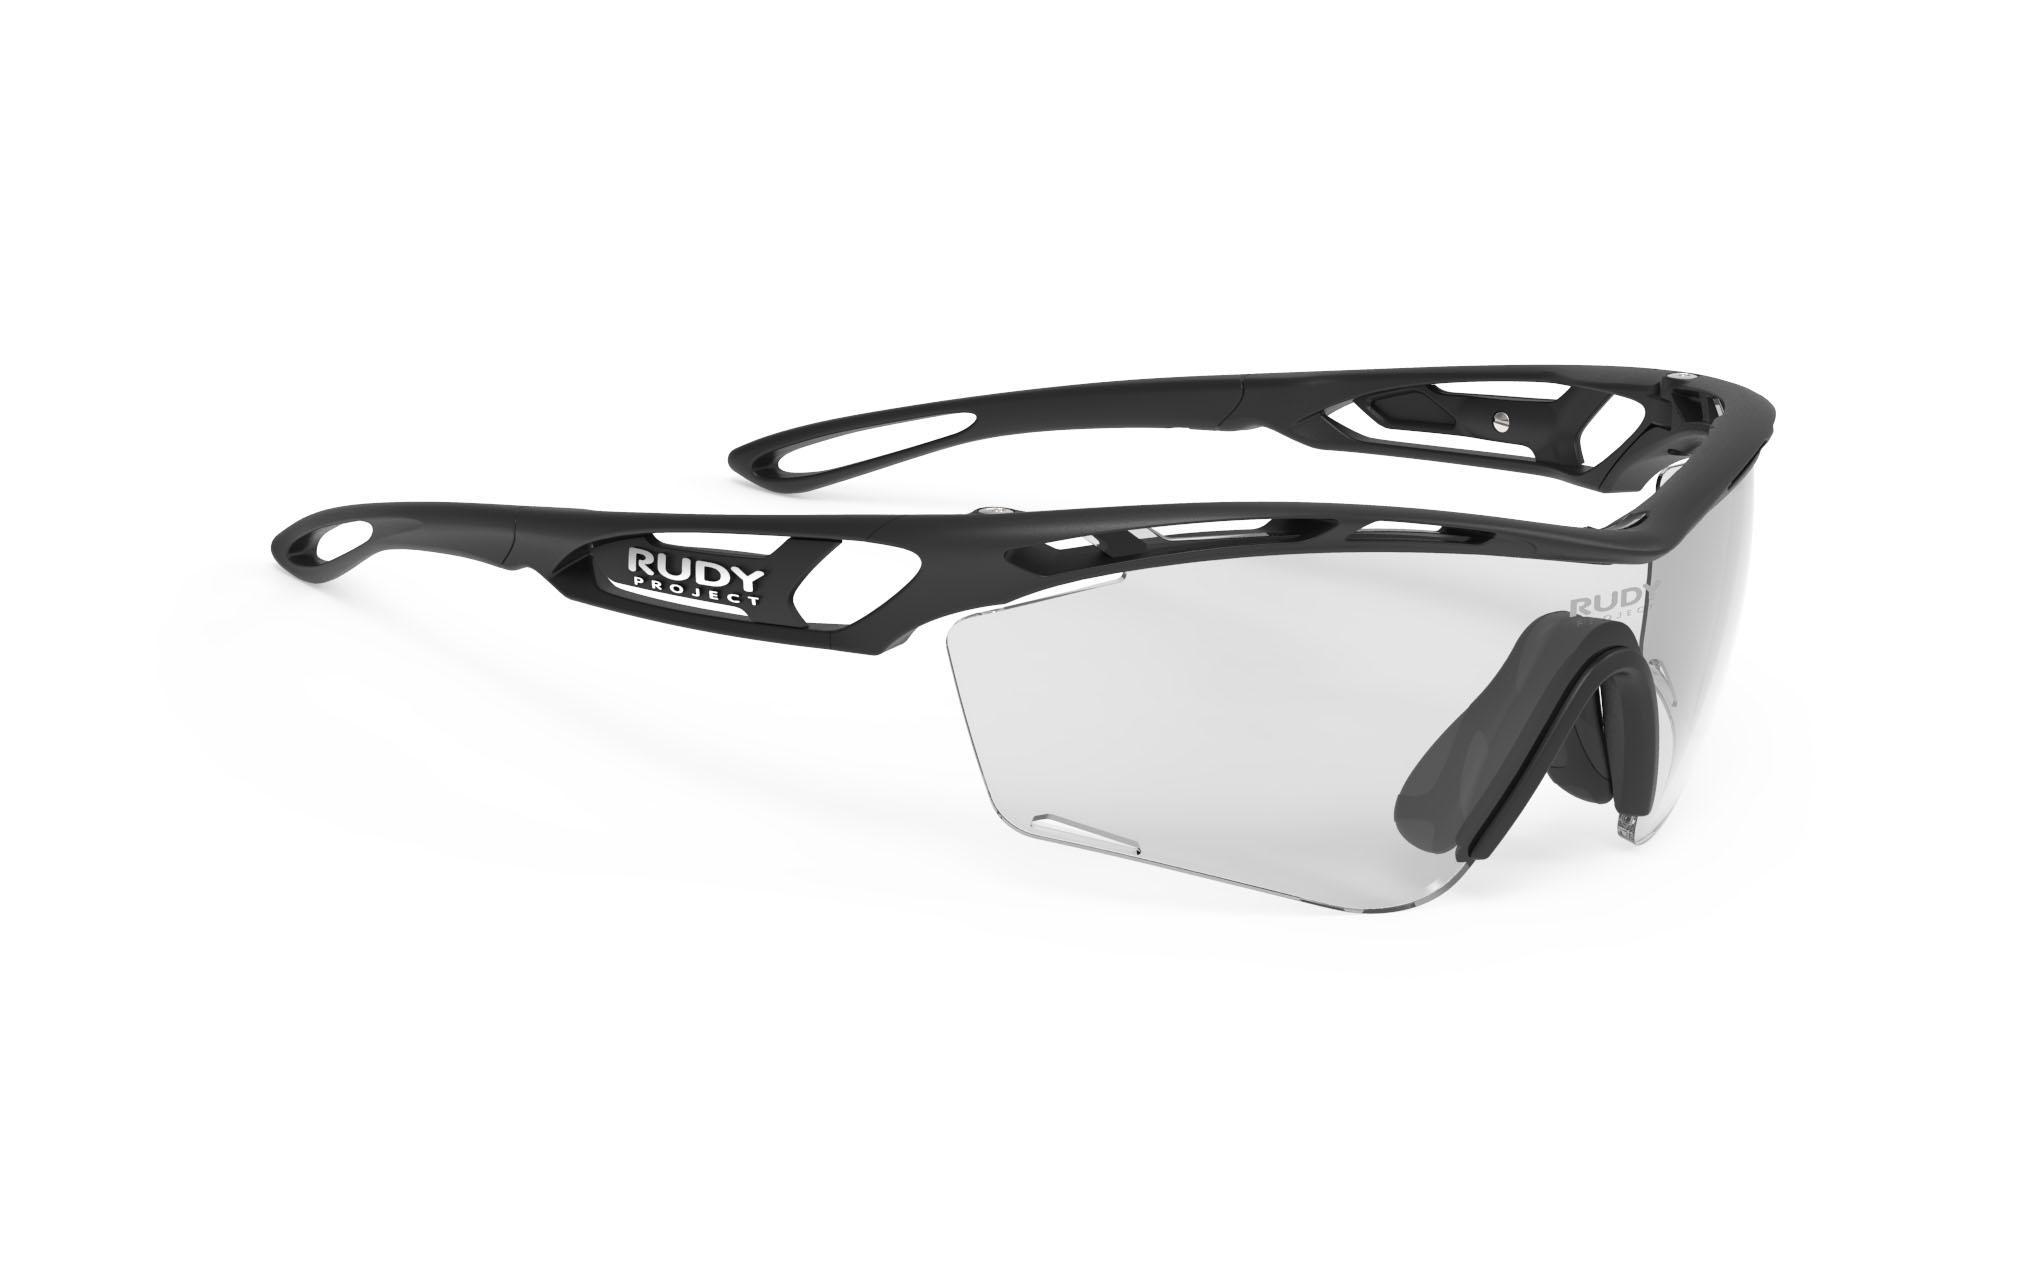 Tralyx SLIM Matte Black - ImpactX Photochromic 2 Black